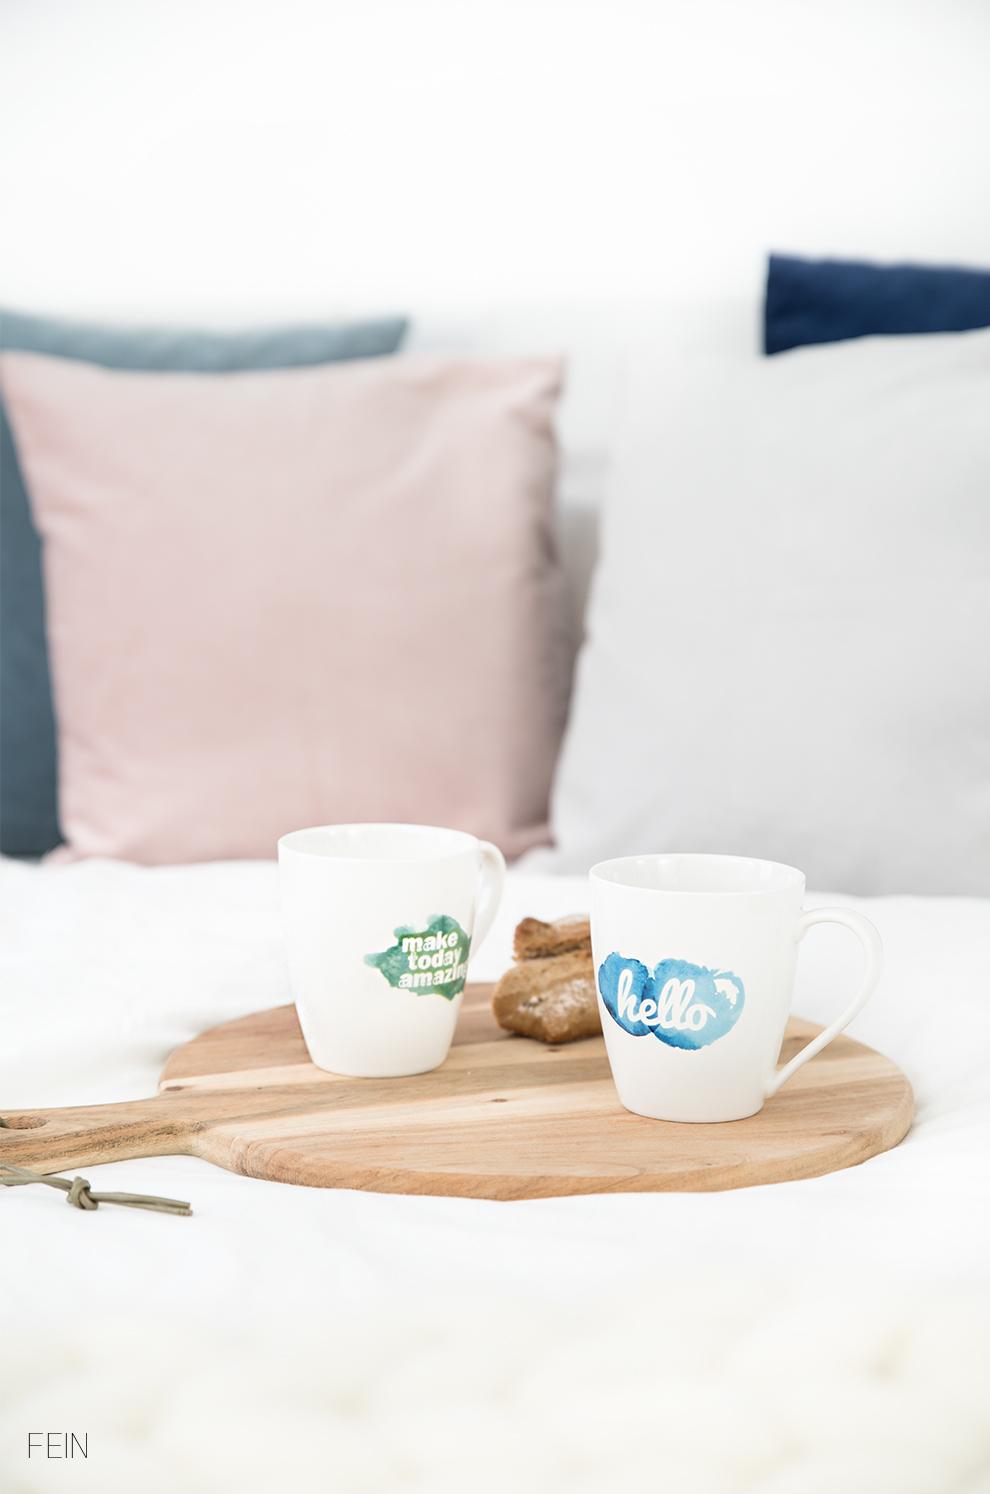 Winter Tee im Bett